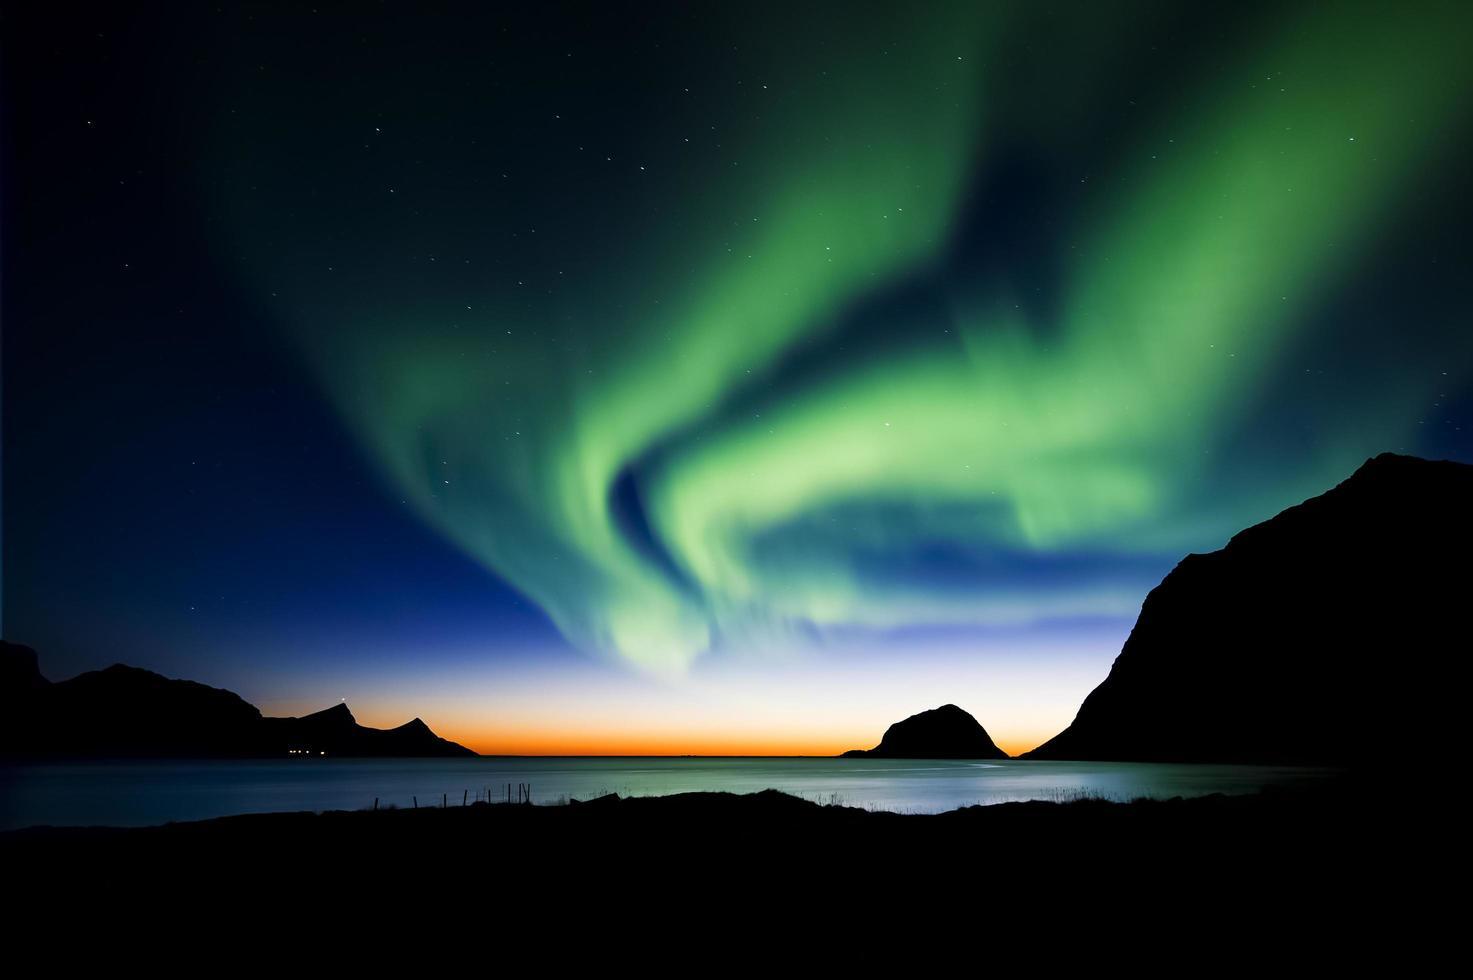 Aurora borealis on night sky photo